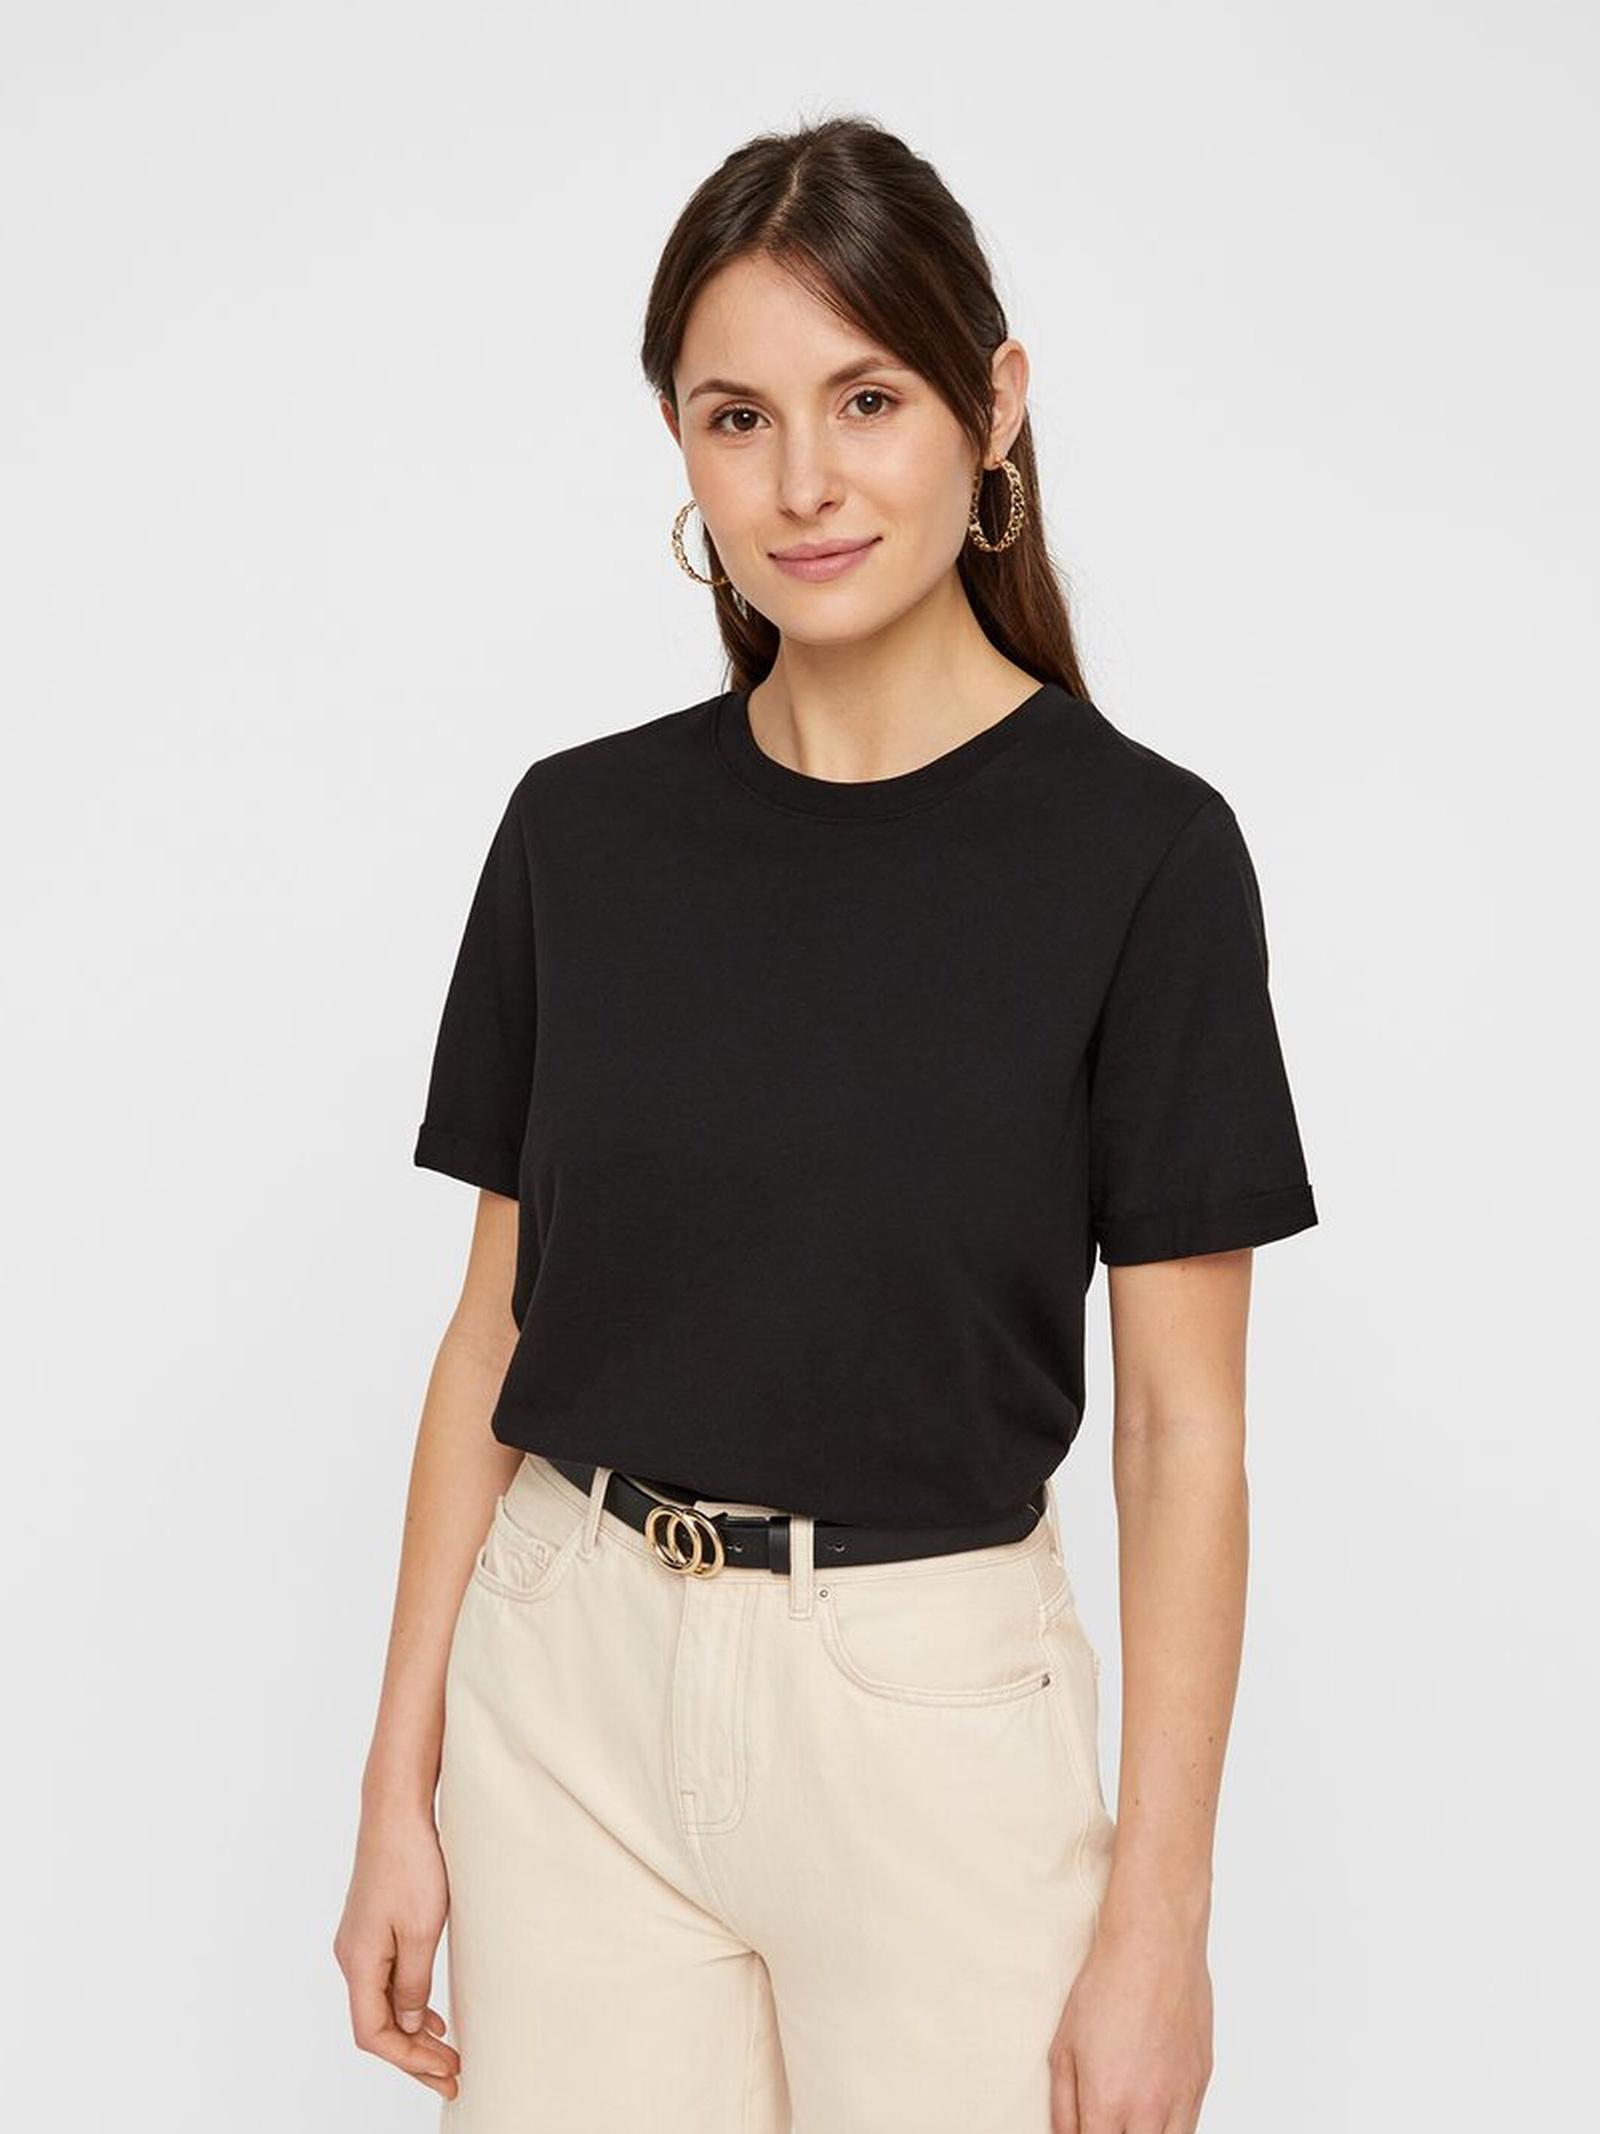 T-SHIRT BASIC PIECES   T-shirt   17088970NERO